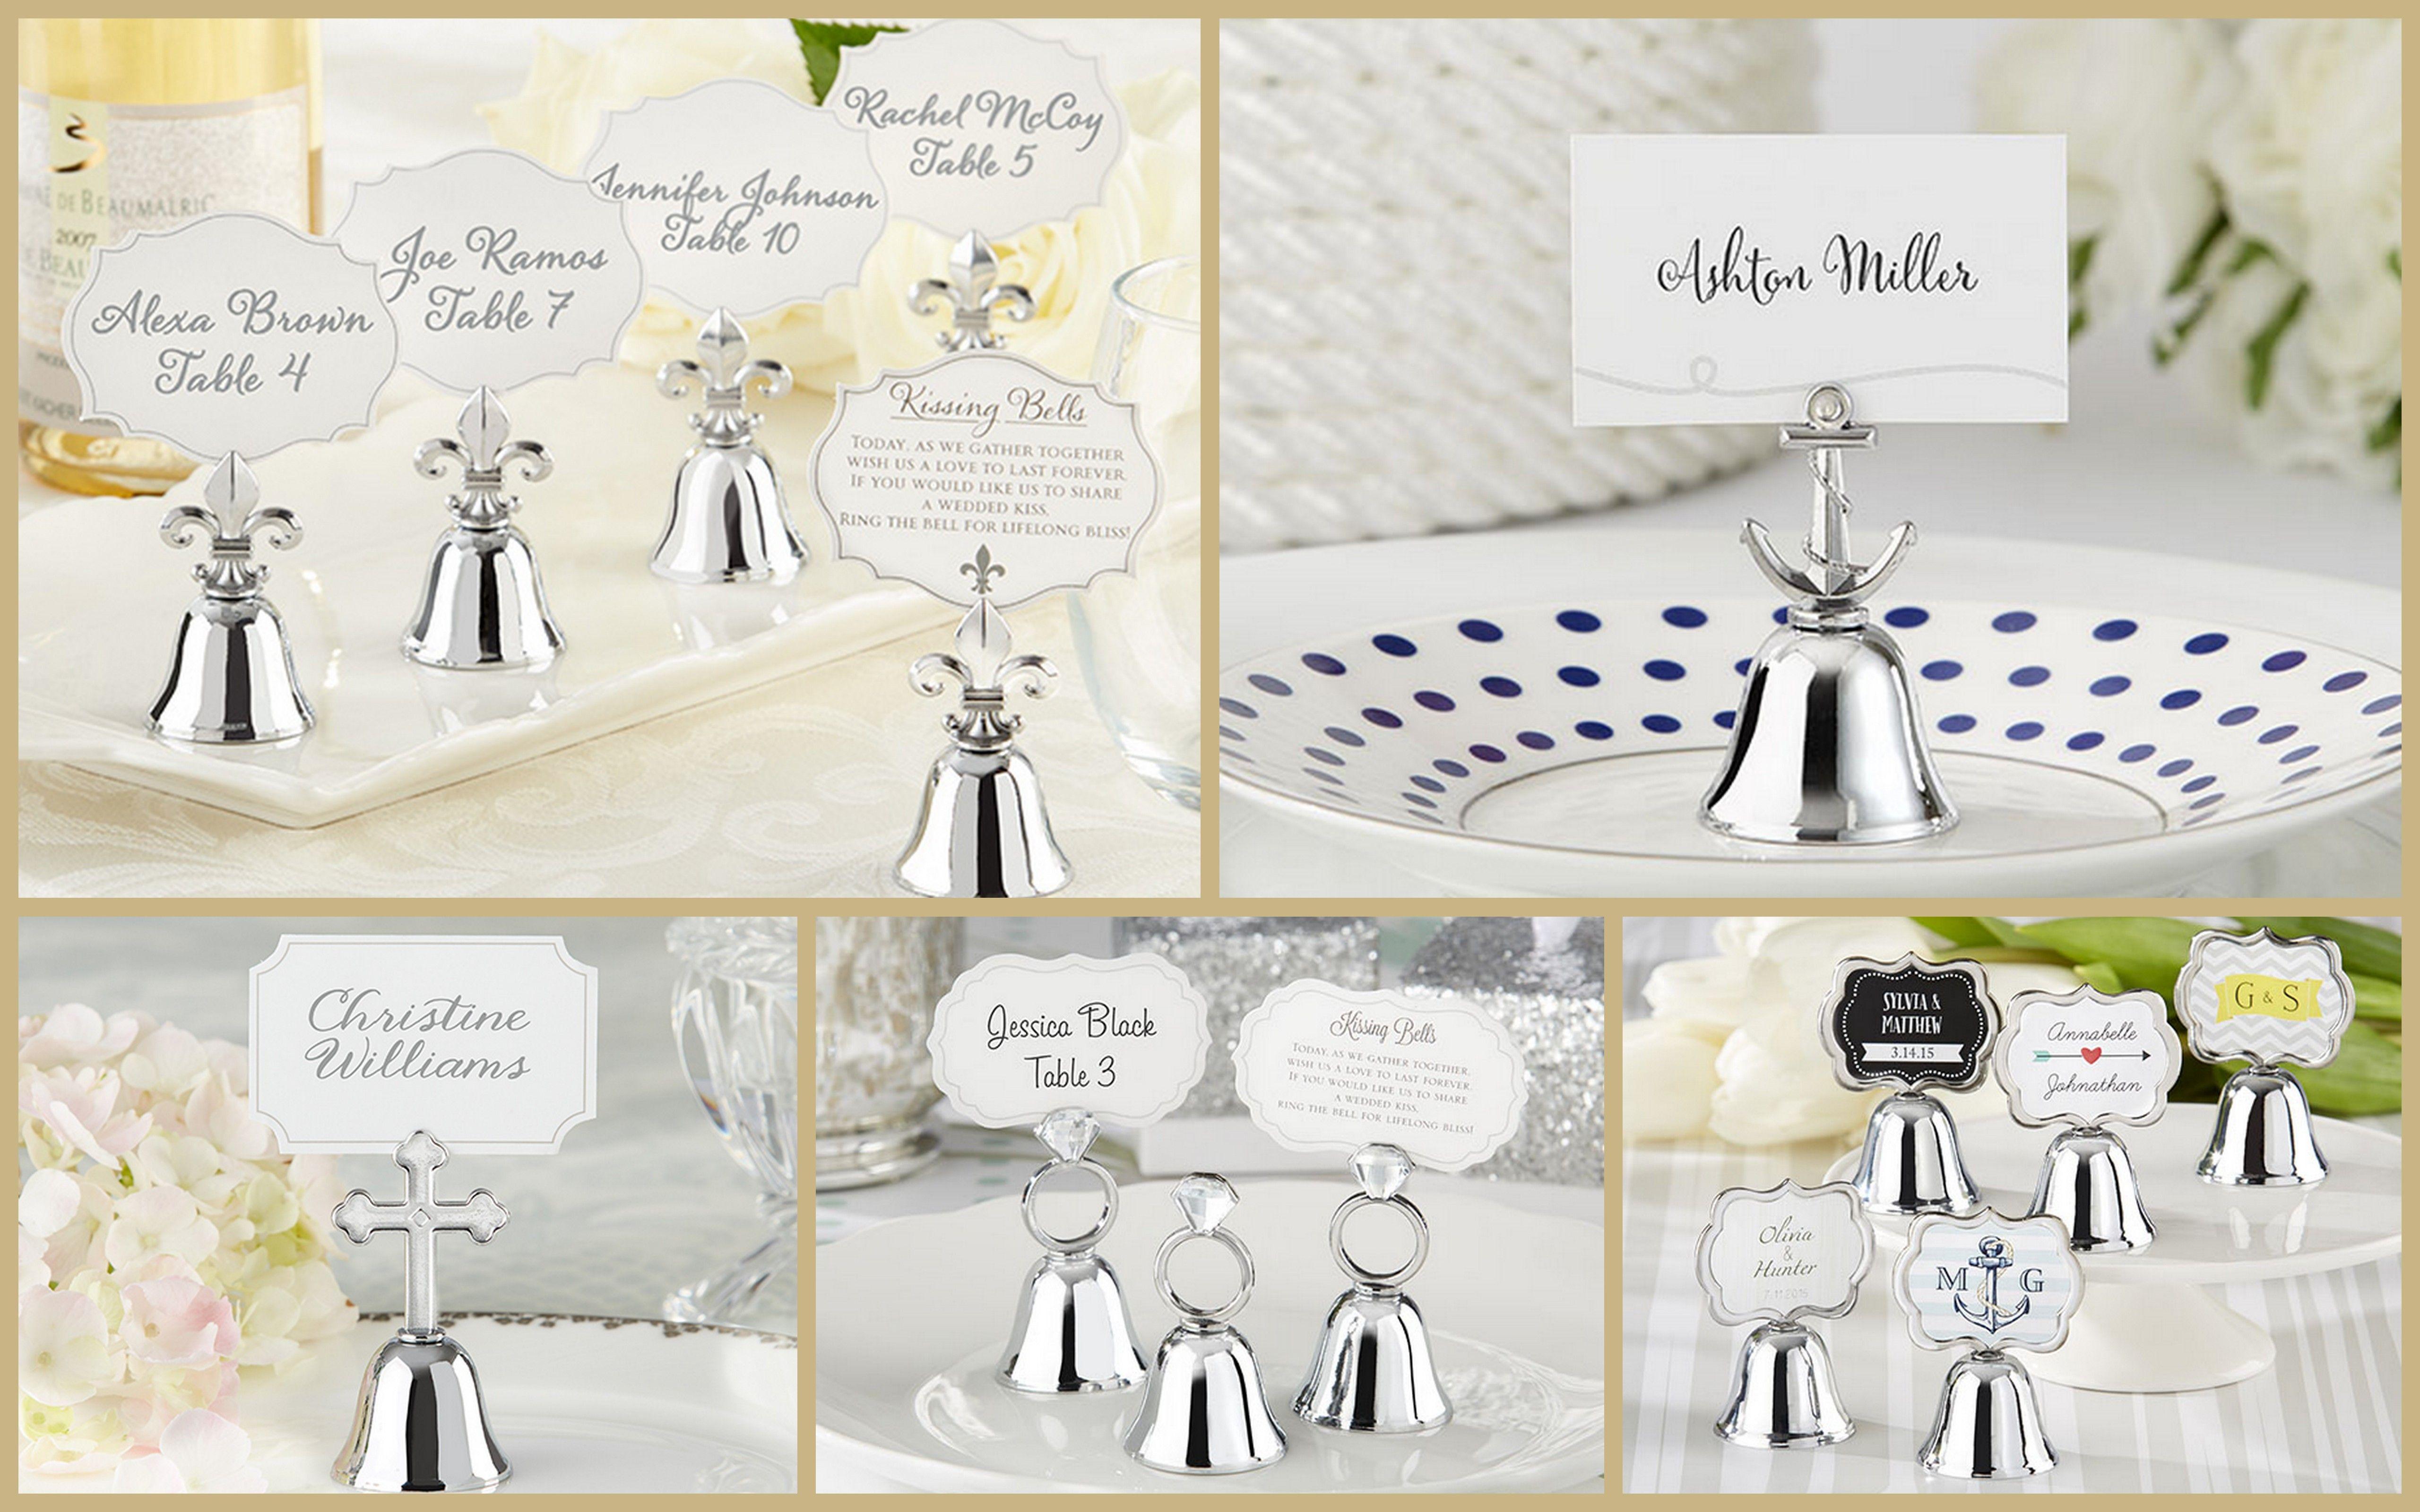 kissing bell wedding favors | Sailboat Party Favors | Pinterest ...